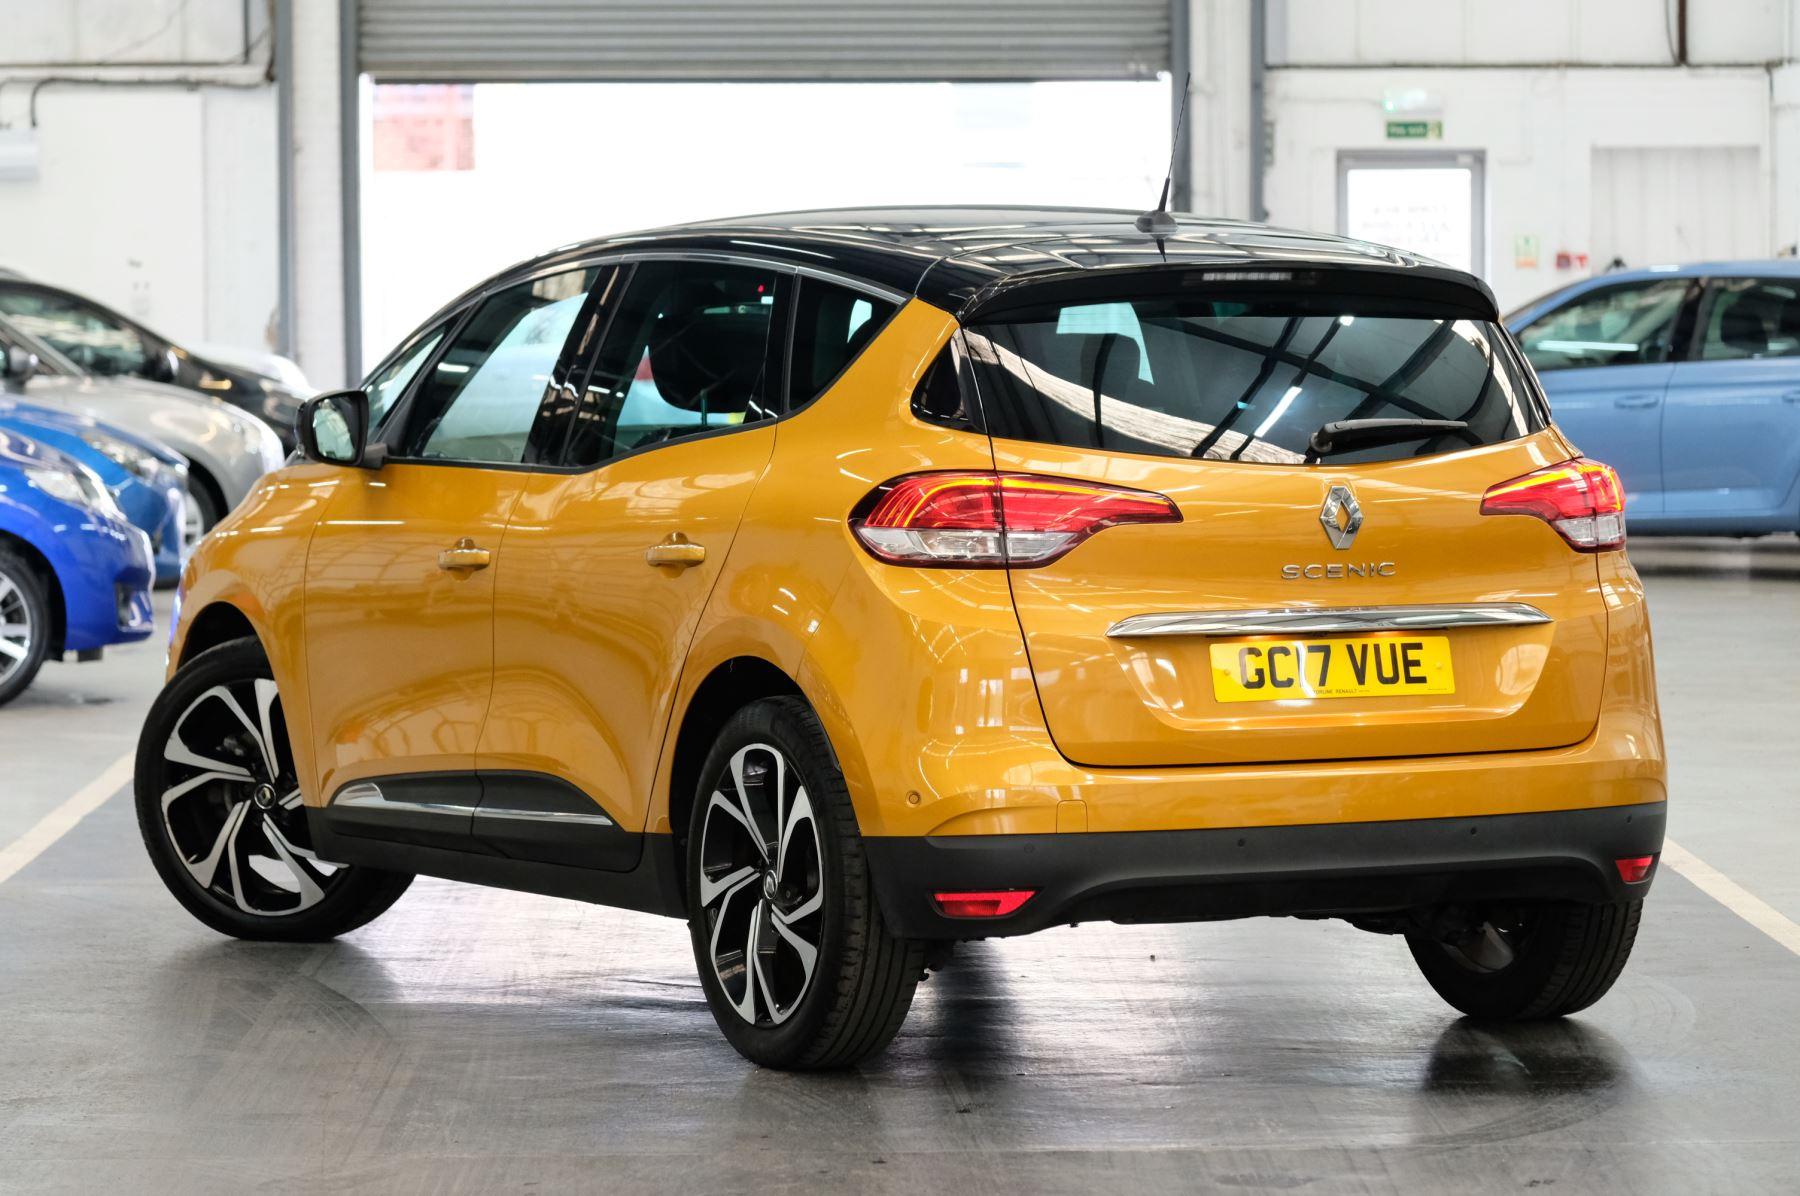 Renault Scenic 1.6 dCi Signature Nav 5dr image 2